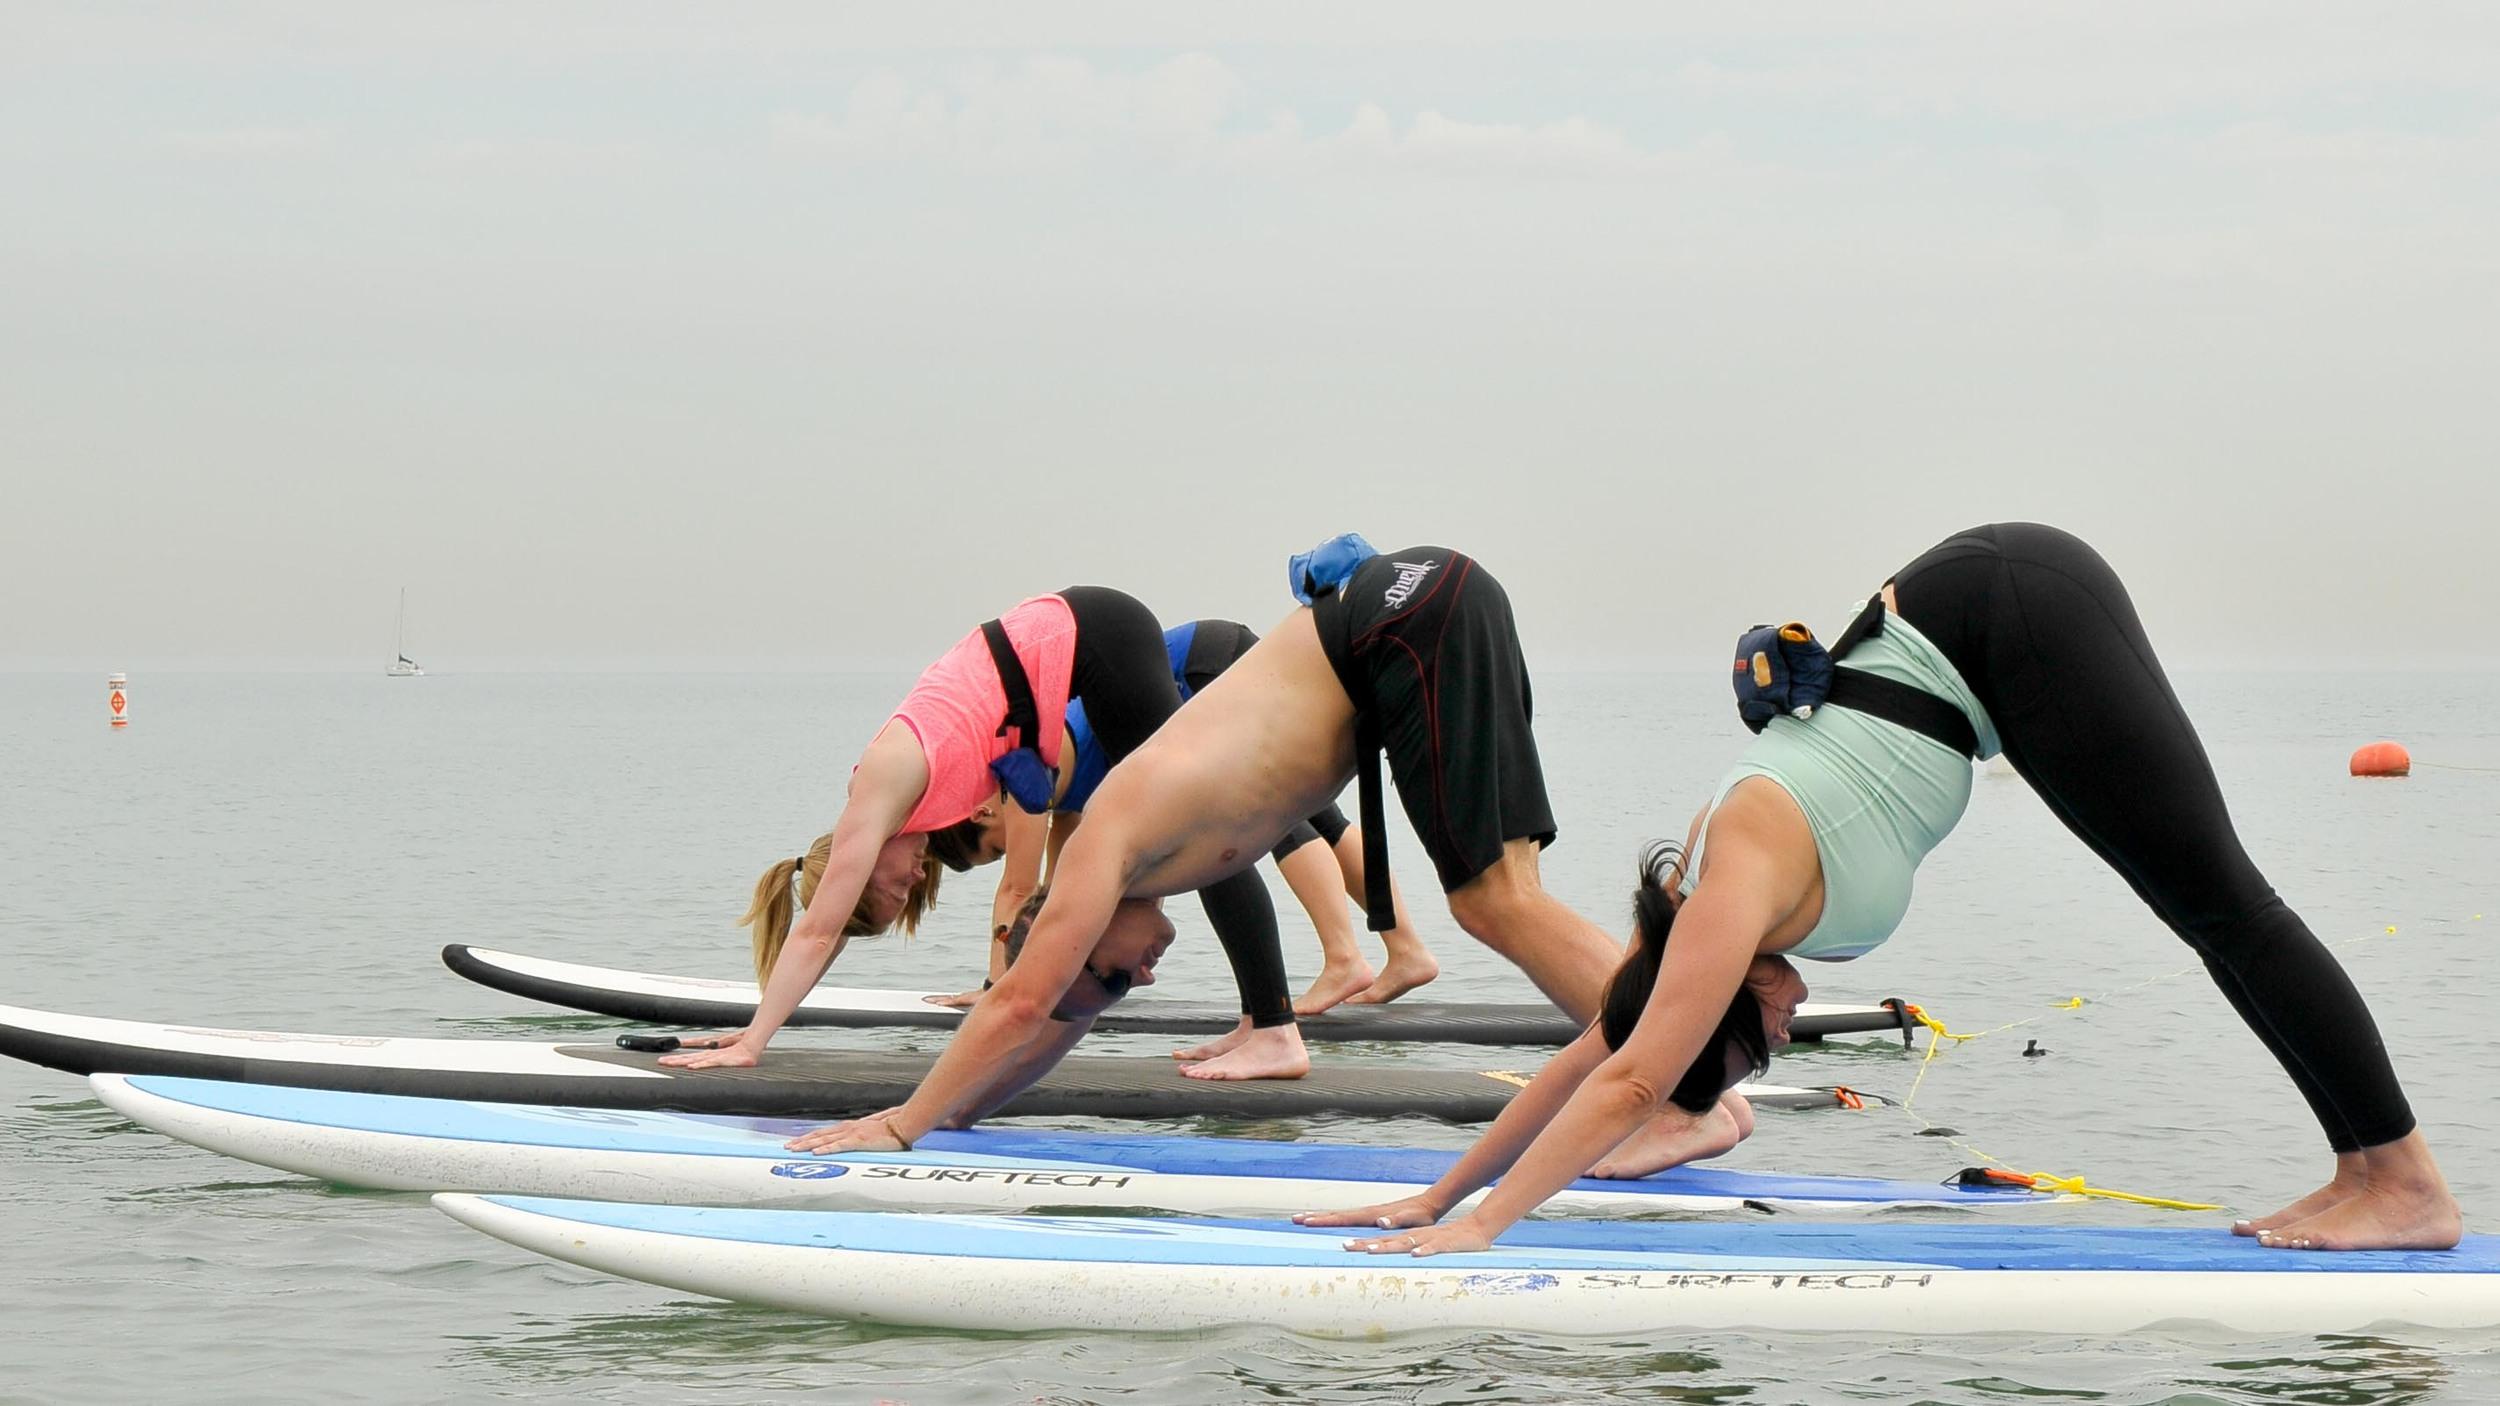 ChicagoSUP Yoga Fitness Photo (8 of 9).jpg